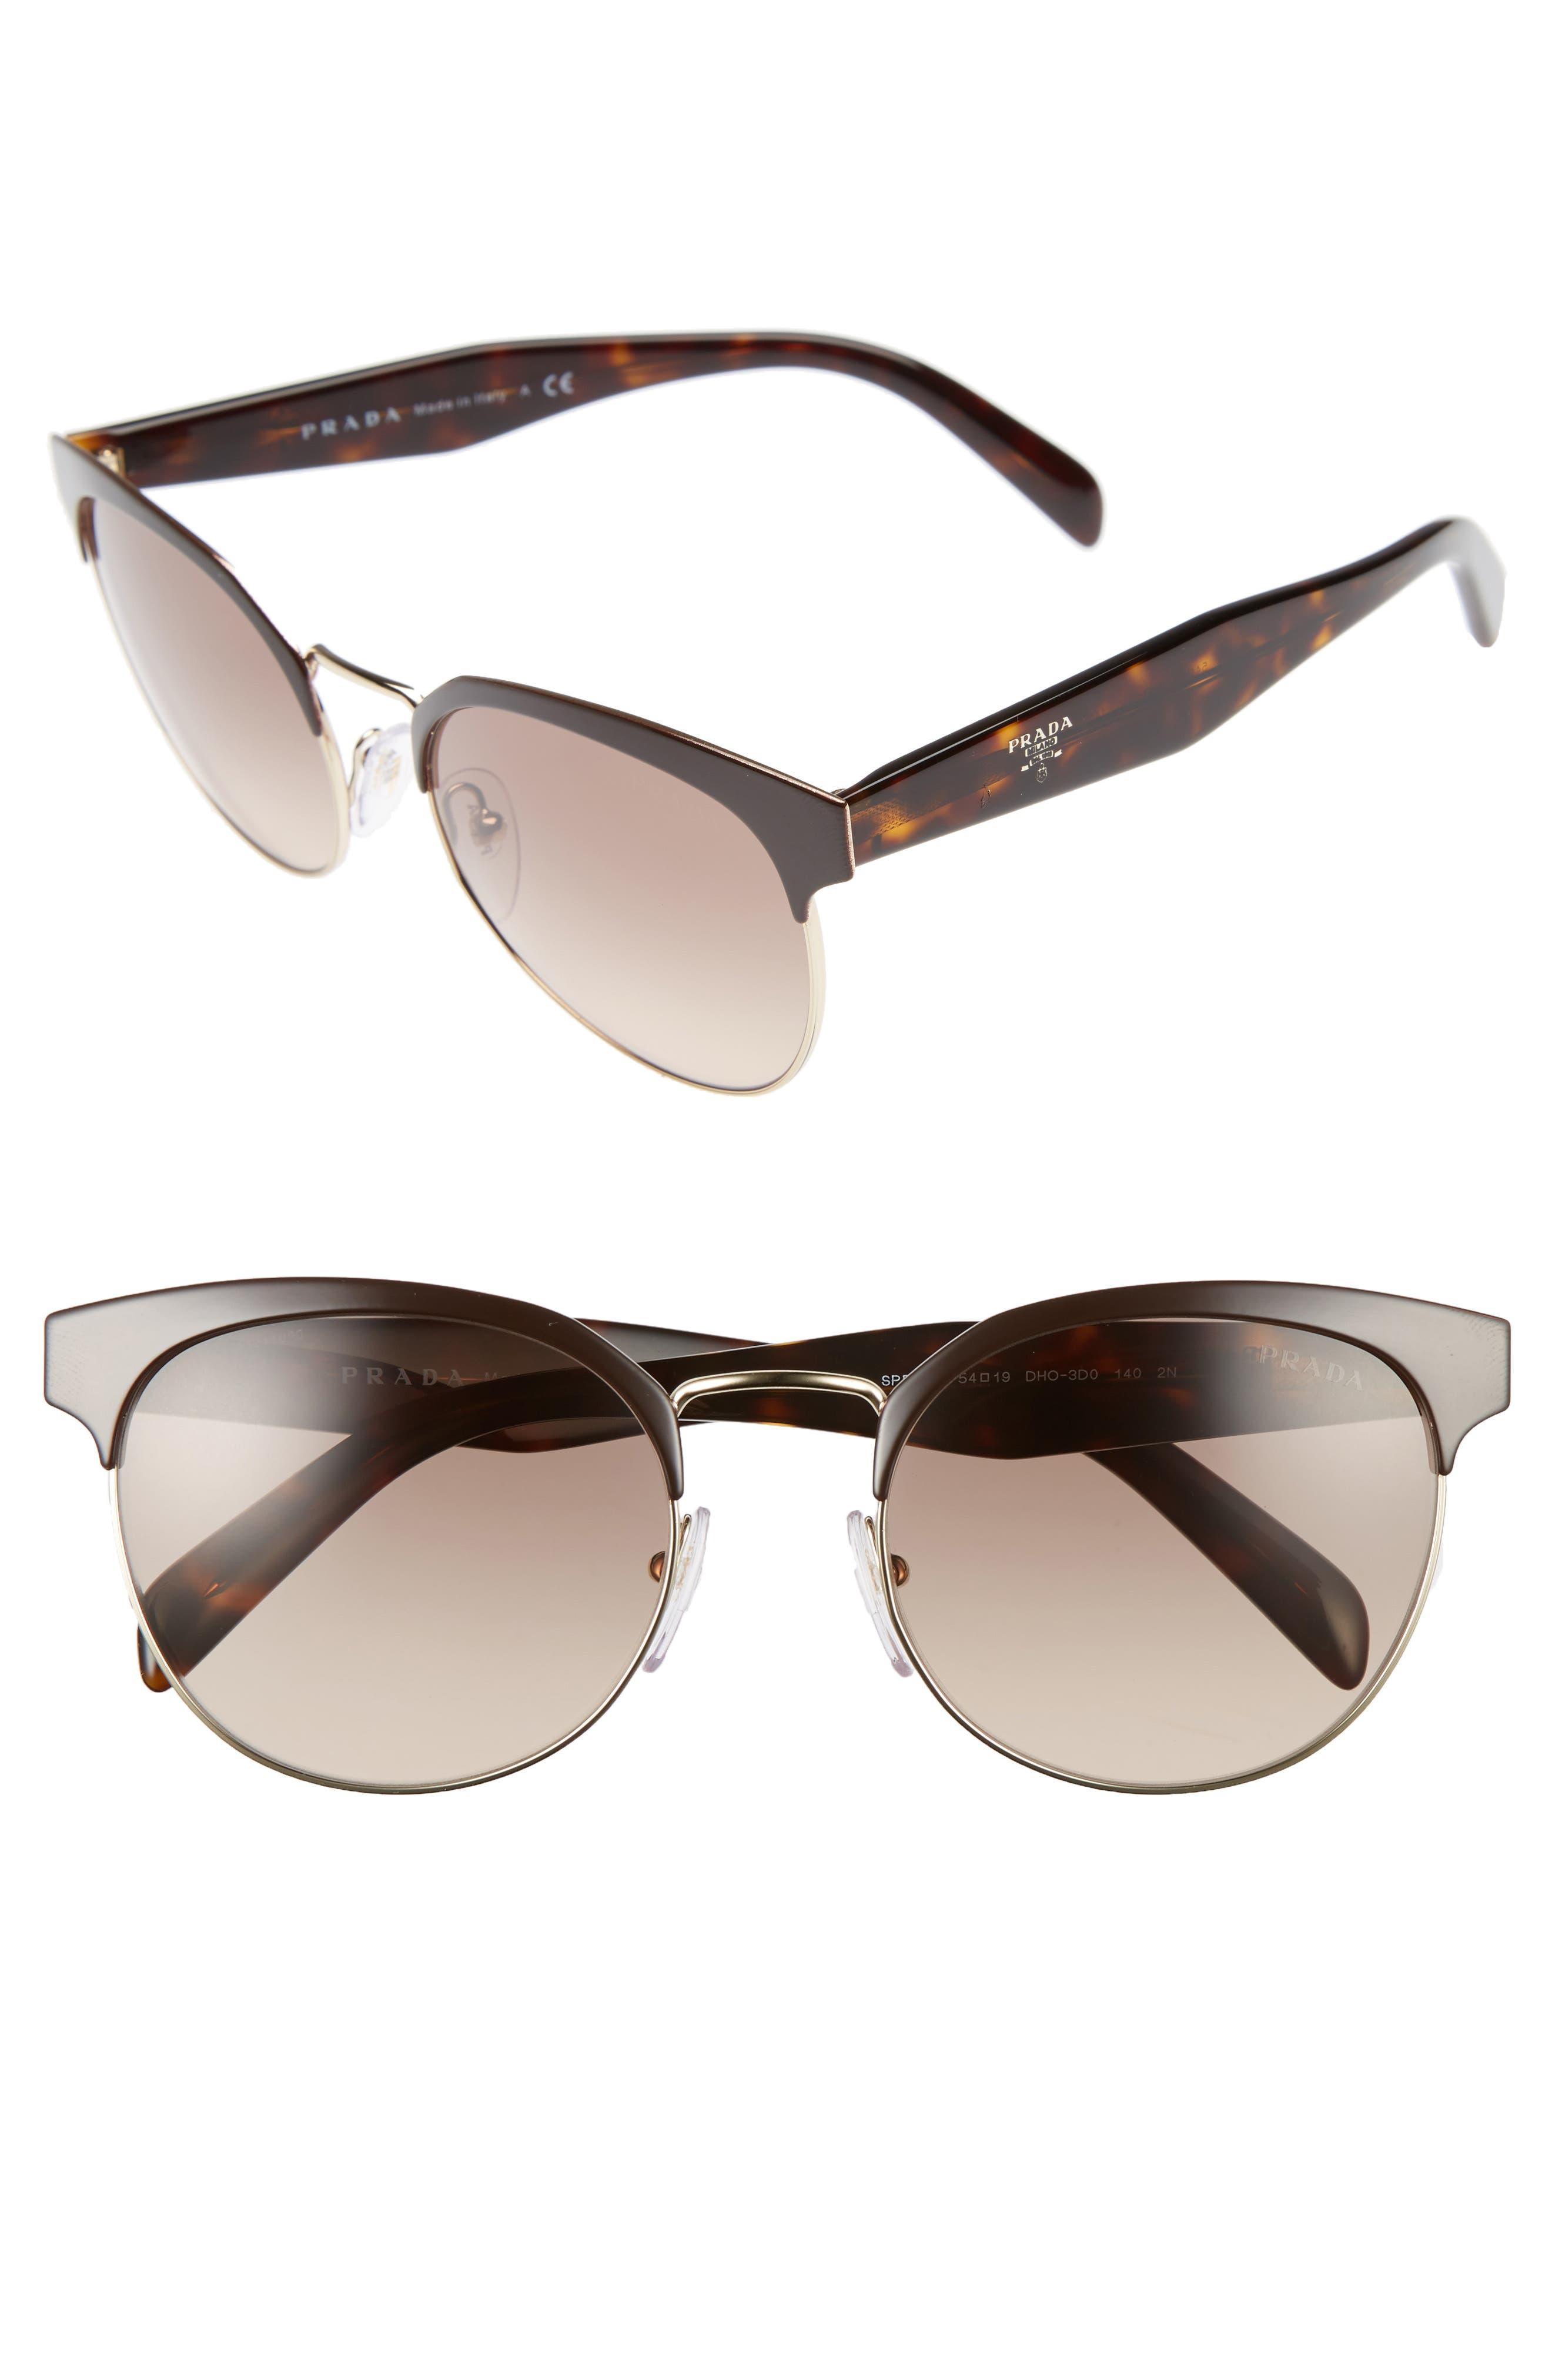 54mm Gradient Round Sunglasses,                         Main,                         color,